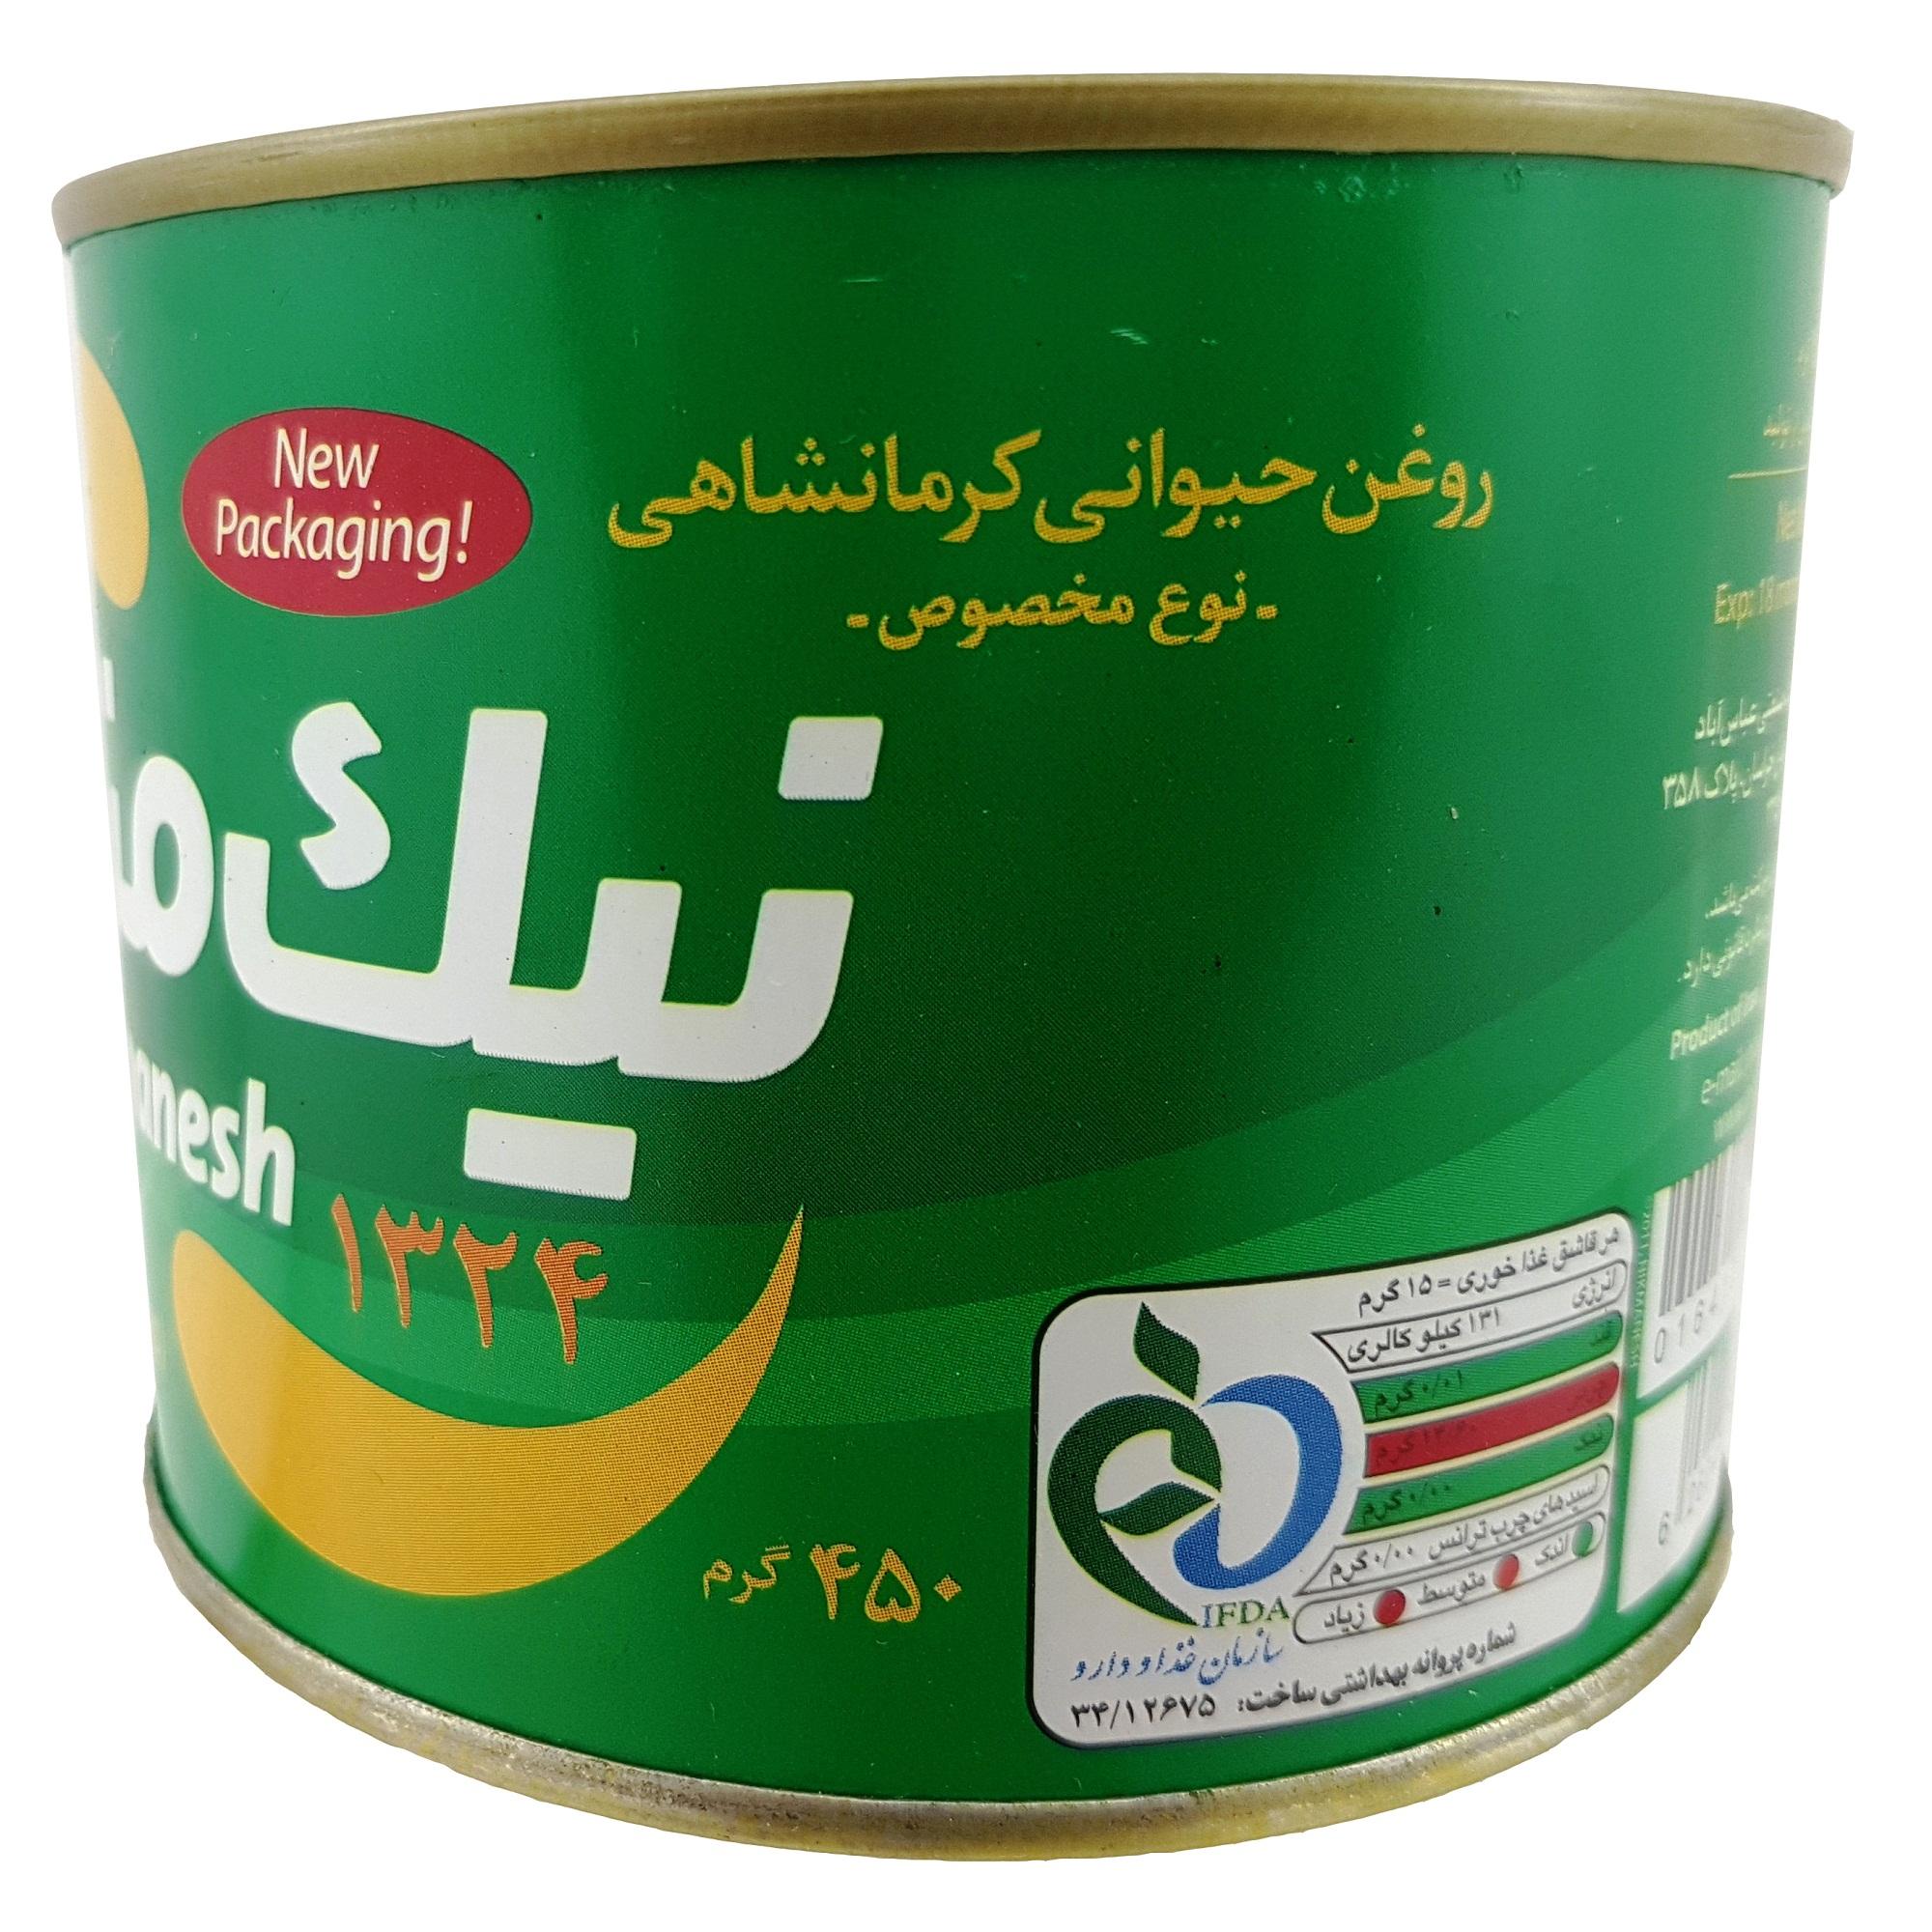 روغن حیوانی کرمانشاهی مخصوص نیک منش - 450 گرم